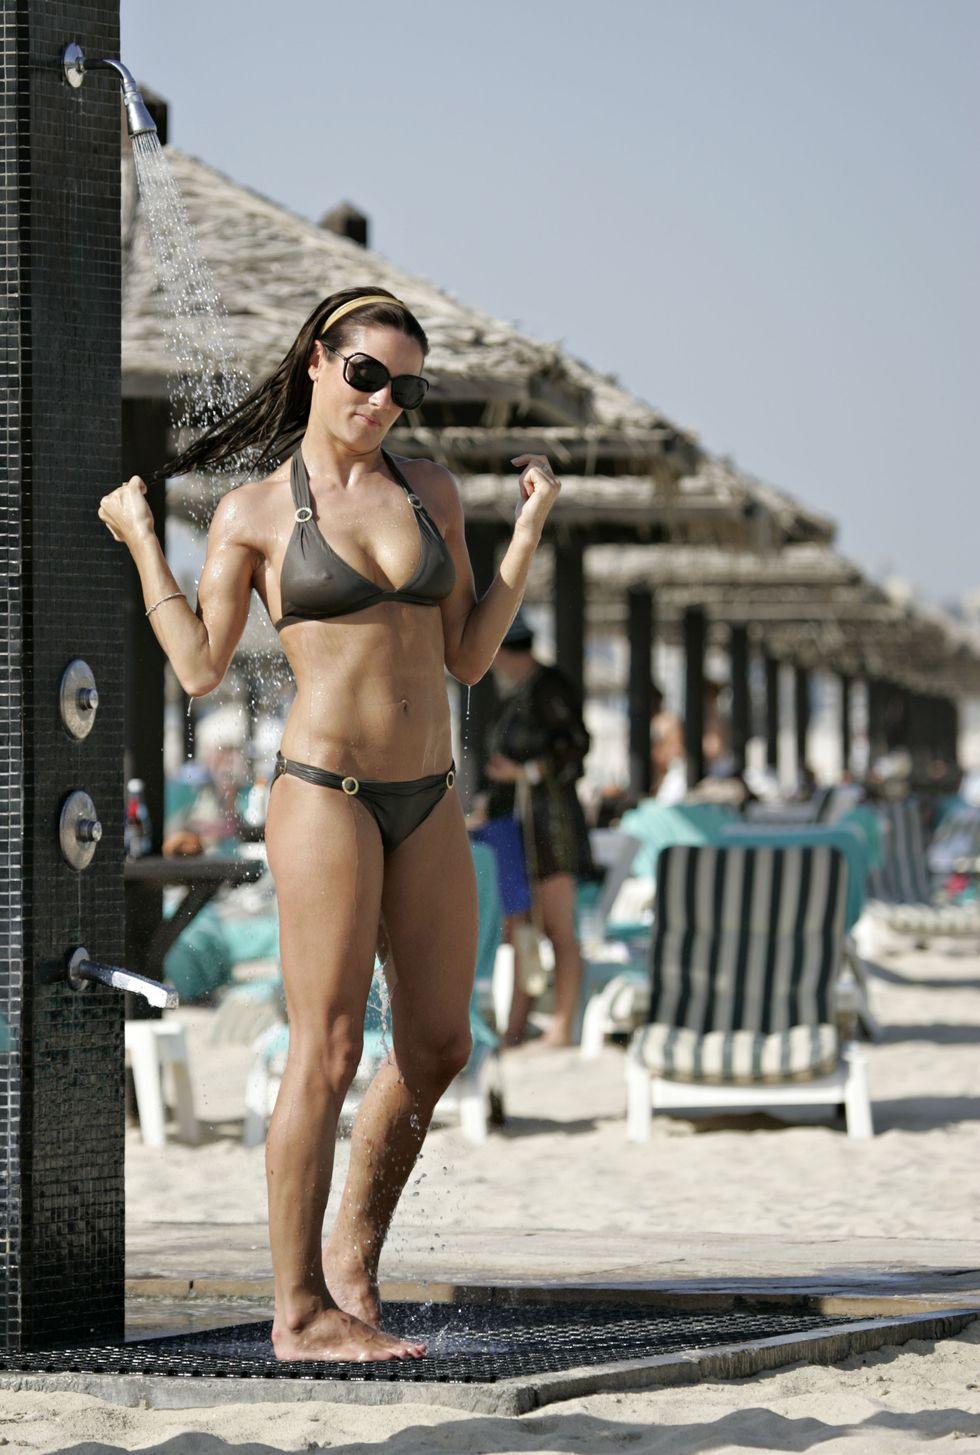 natalie-pinkham-bikini-candids-in-dubai-01